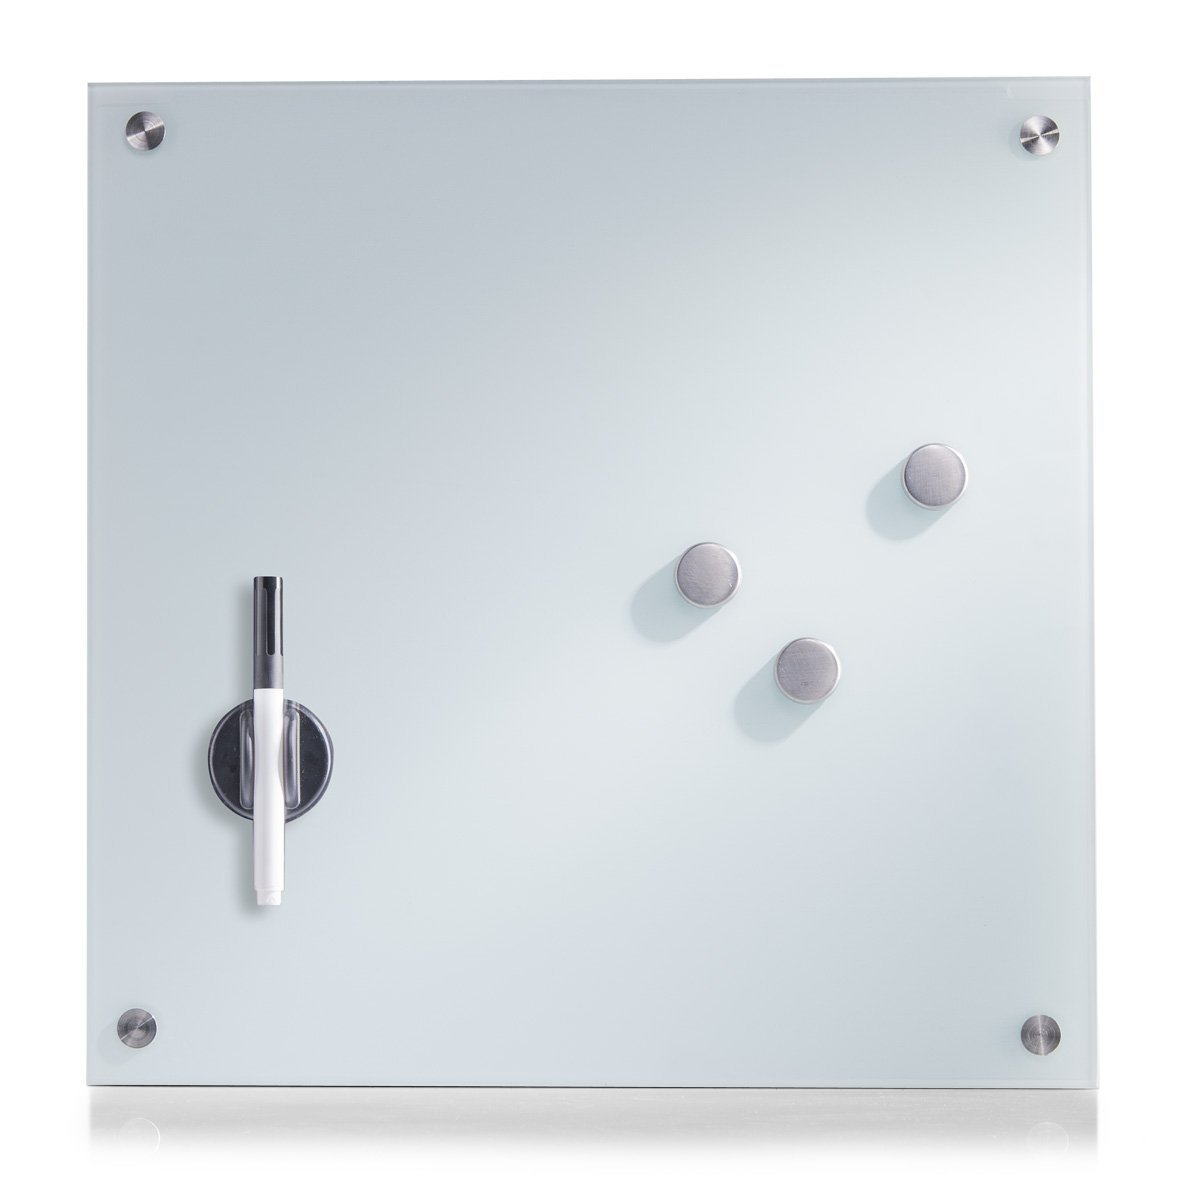 Zeller 11600 Tablero de Notas, Blanco, 40x40x3 cm